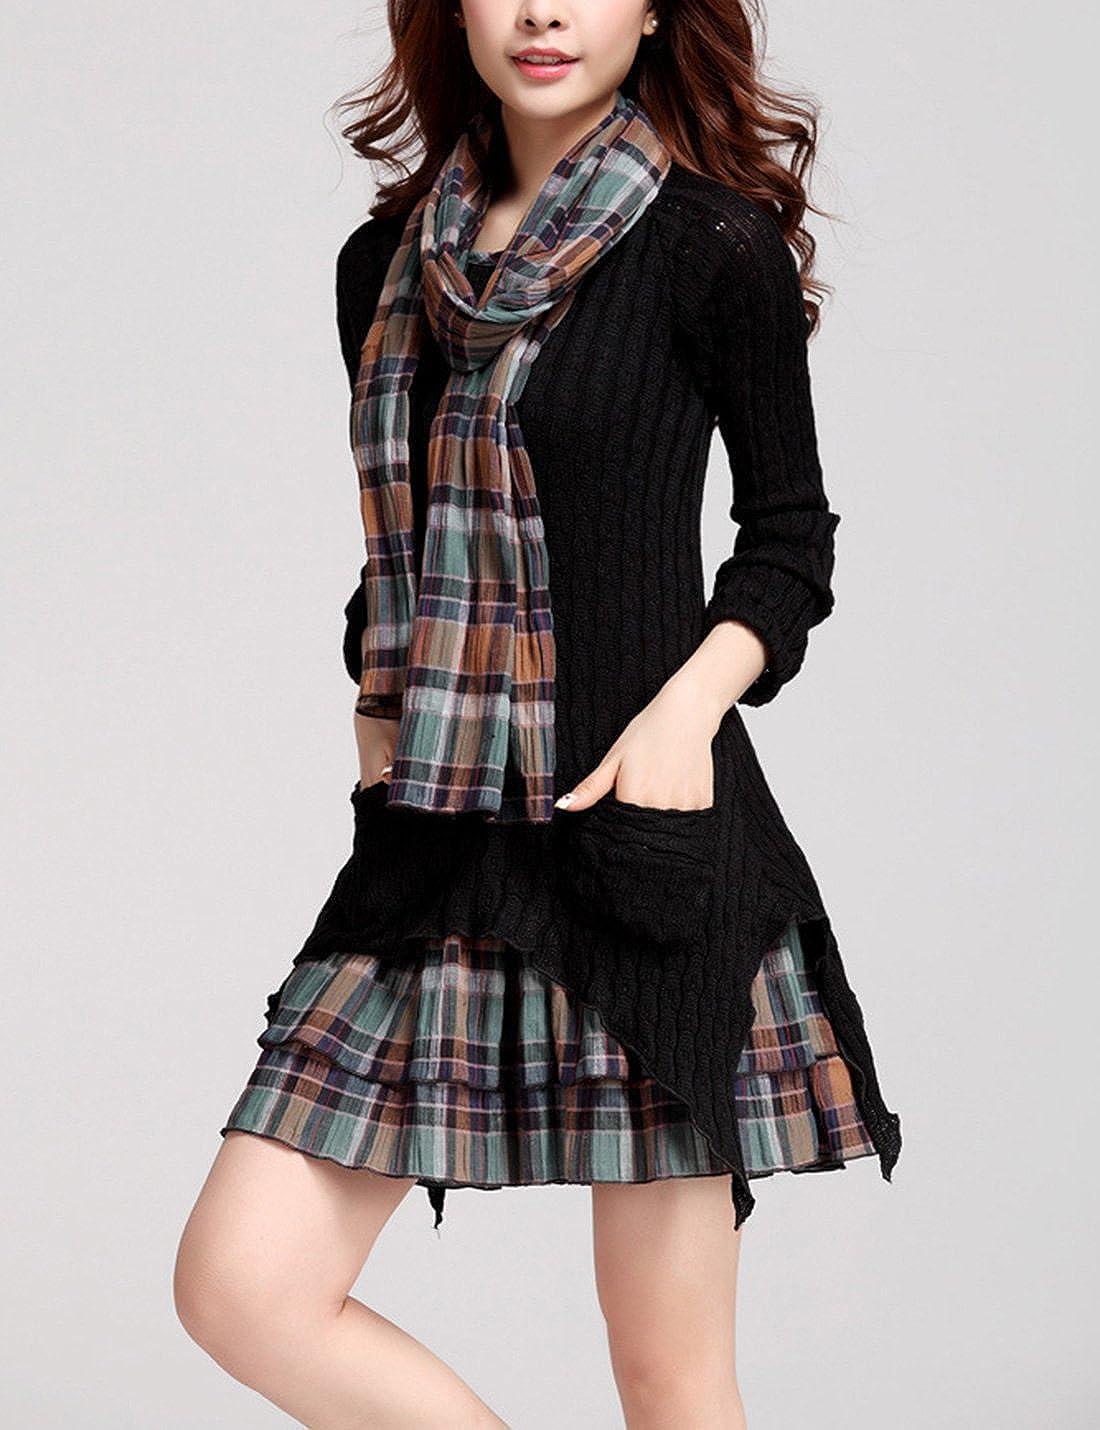 Gihuo Womens Plaid Splicing Bodycon Sweater Dress Knit Tunic Top with Irregular Hem